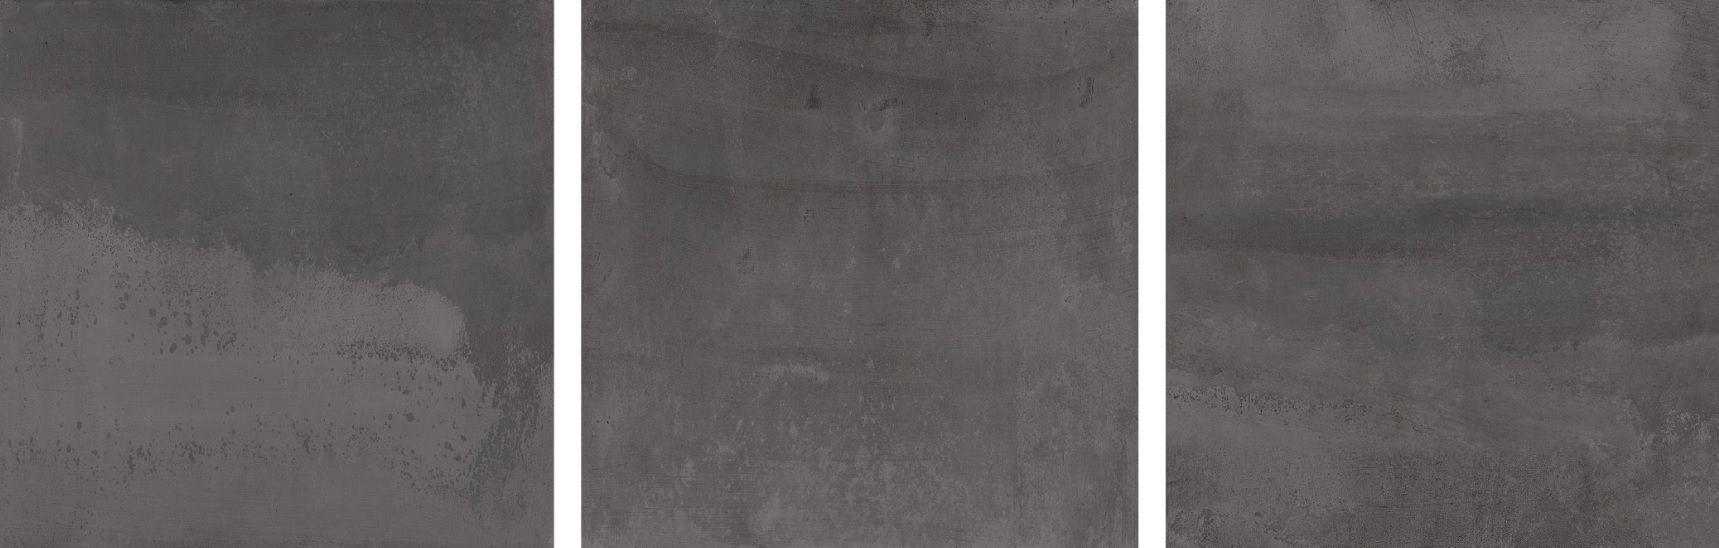 Jabo Vloertegels Concrete Antraciet 60x60